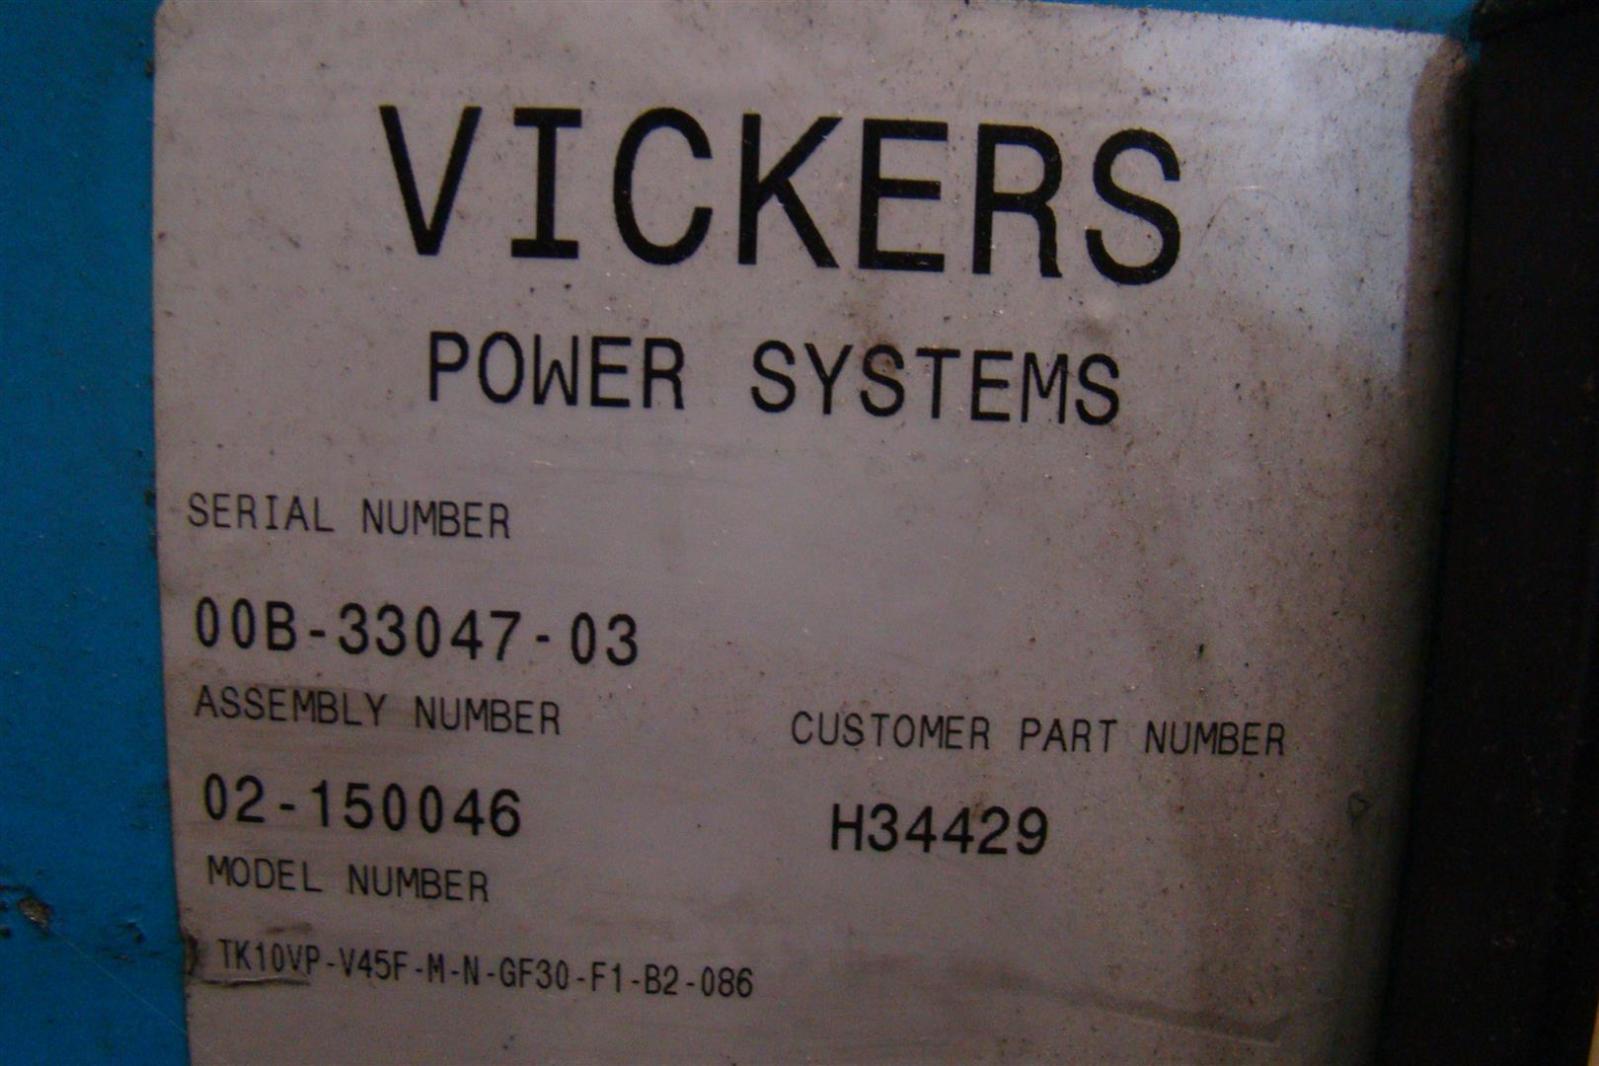 Vickers Hydrualic Power Distrubution Unit 10vp V45F H34429 02-150046